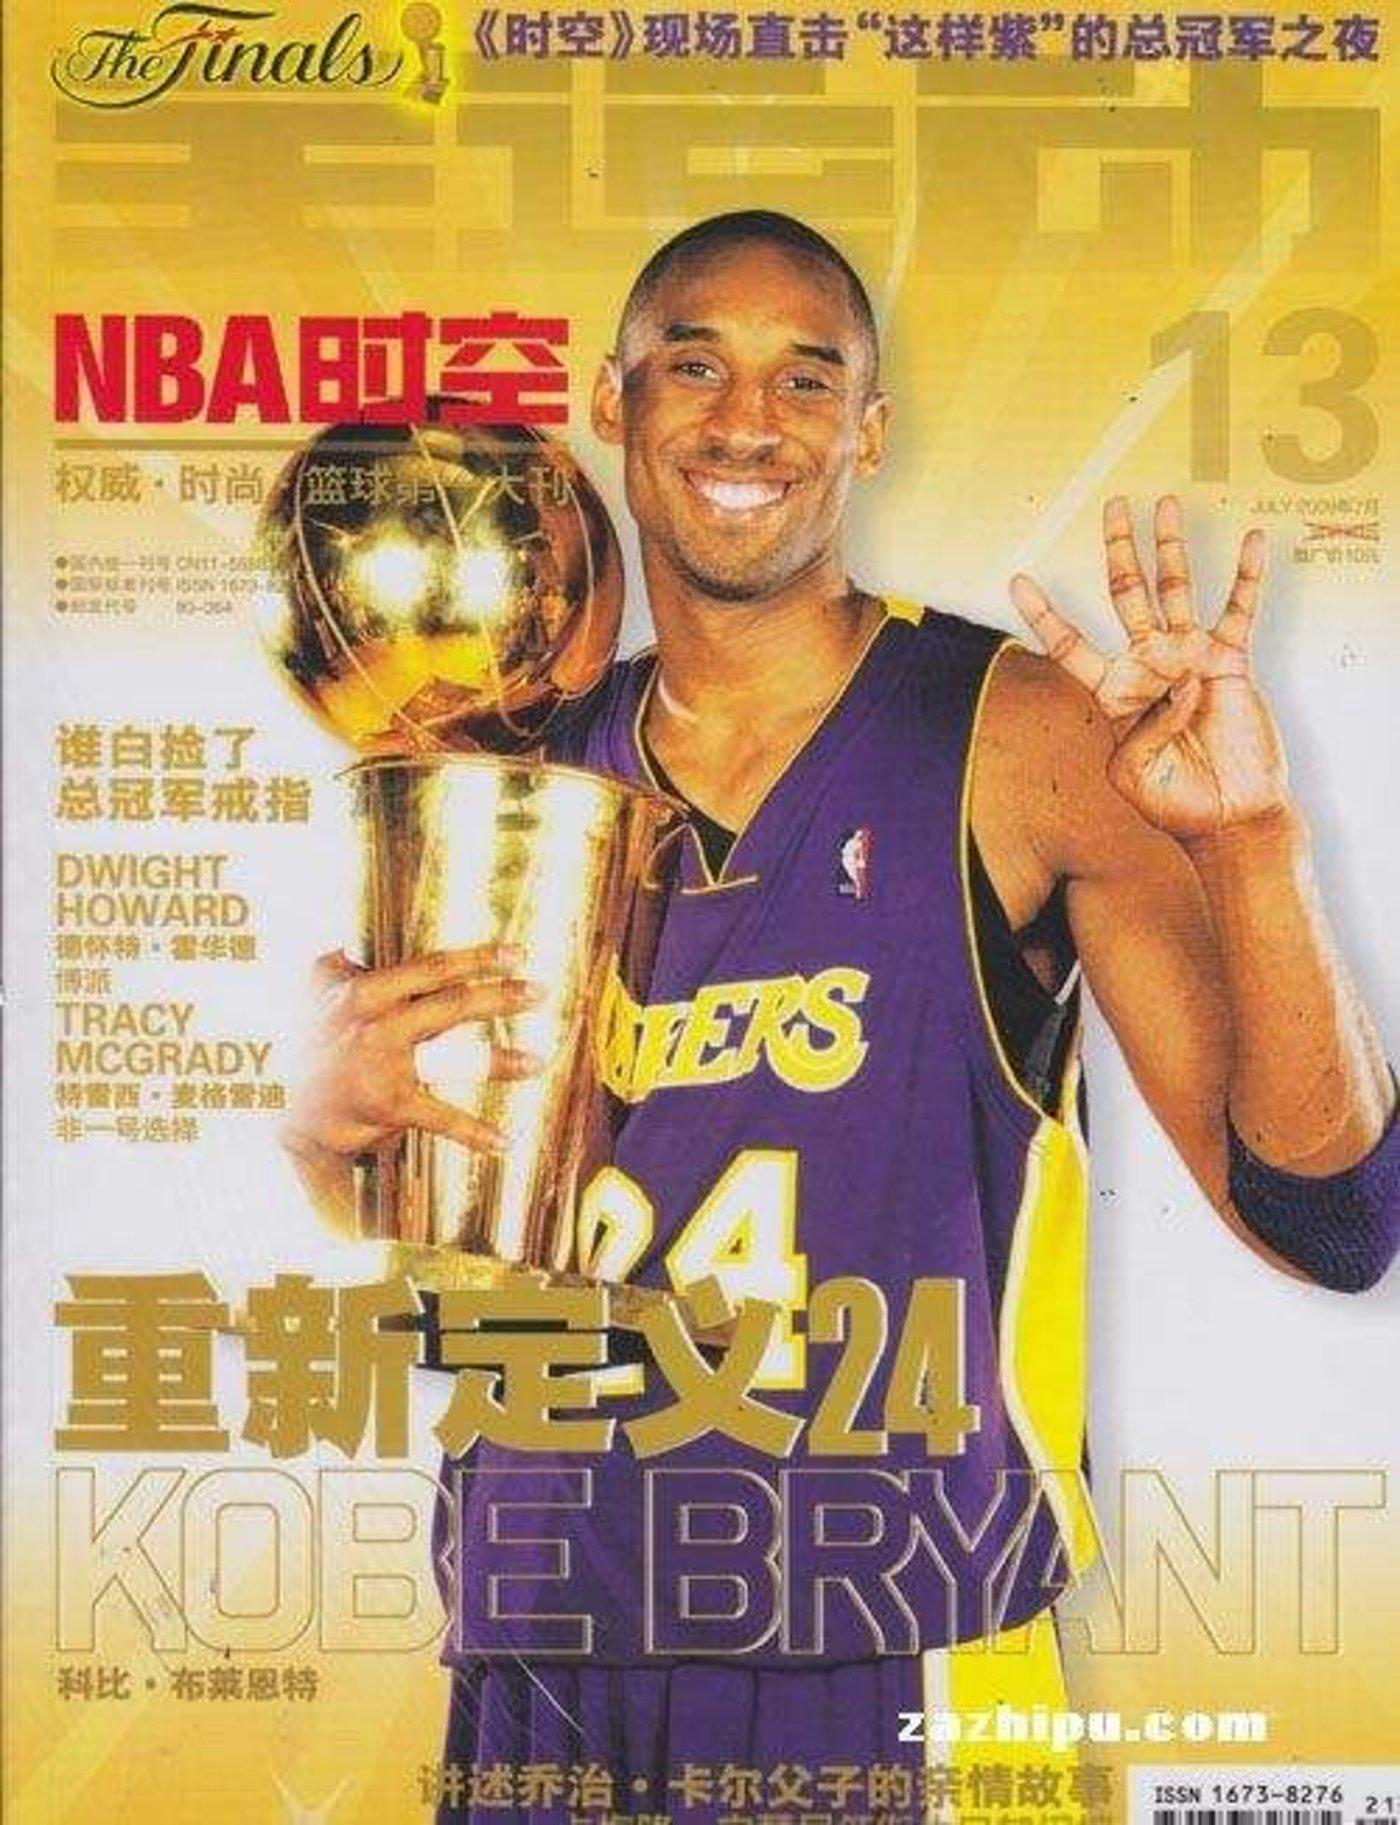 NBA官方杂志《NBA时空》简体中文版